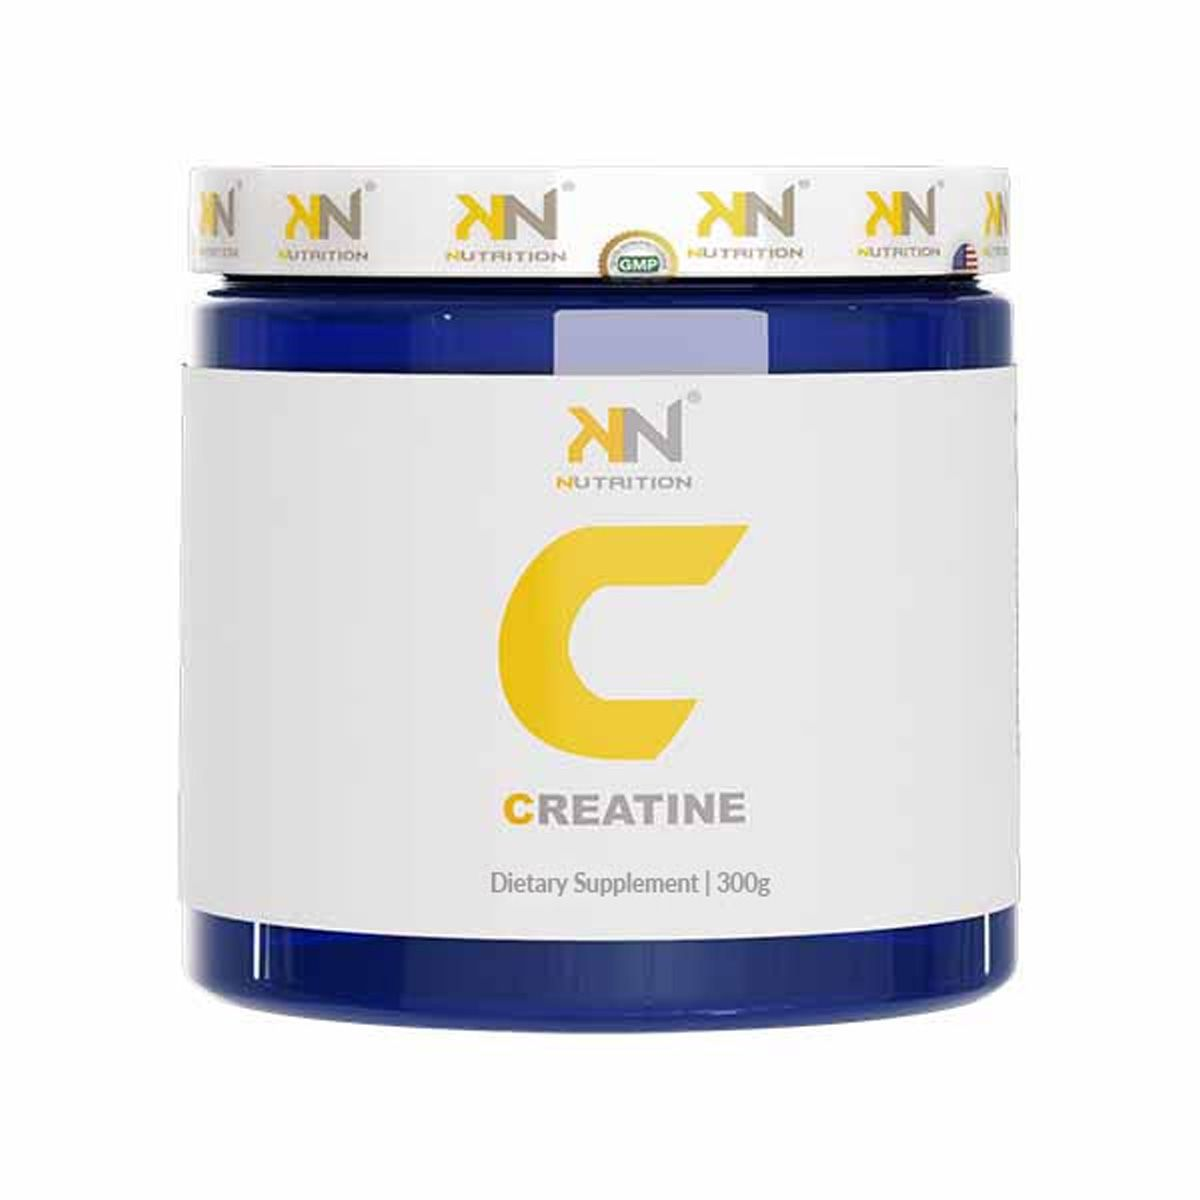 Creatine - 300g - KN Nutrition